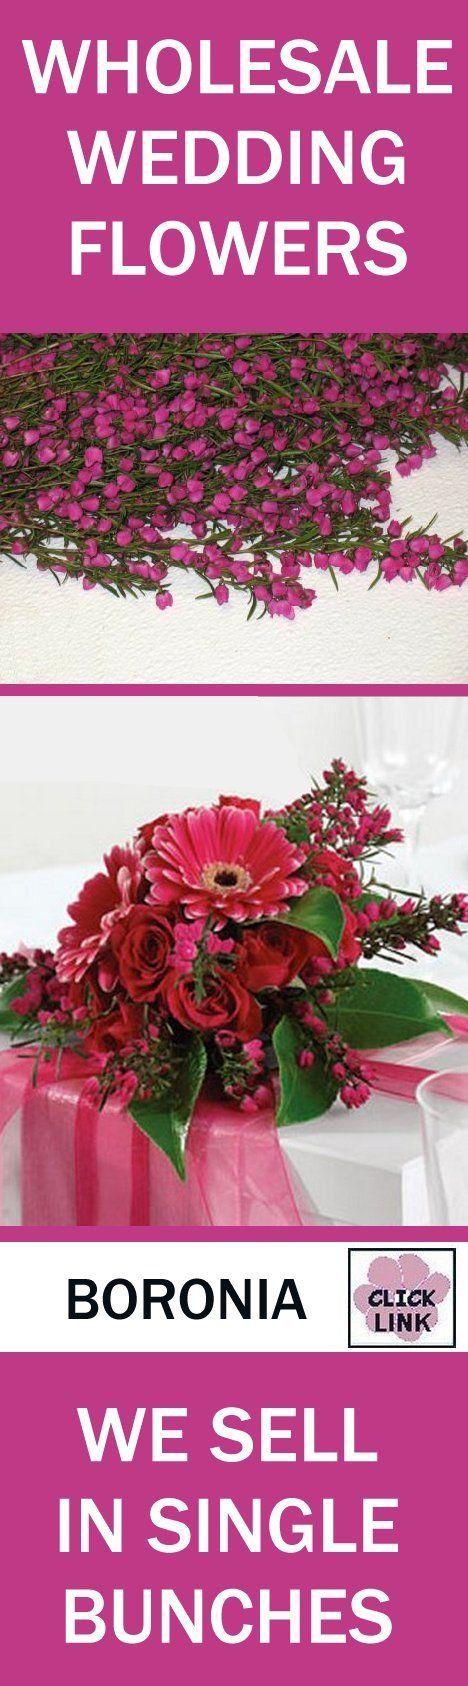 64 best Boronia Heather images on Pinterest | Bridal bouquets ...